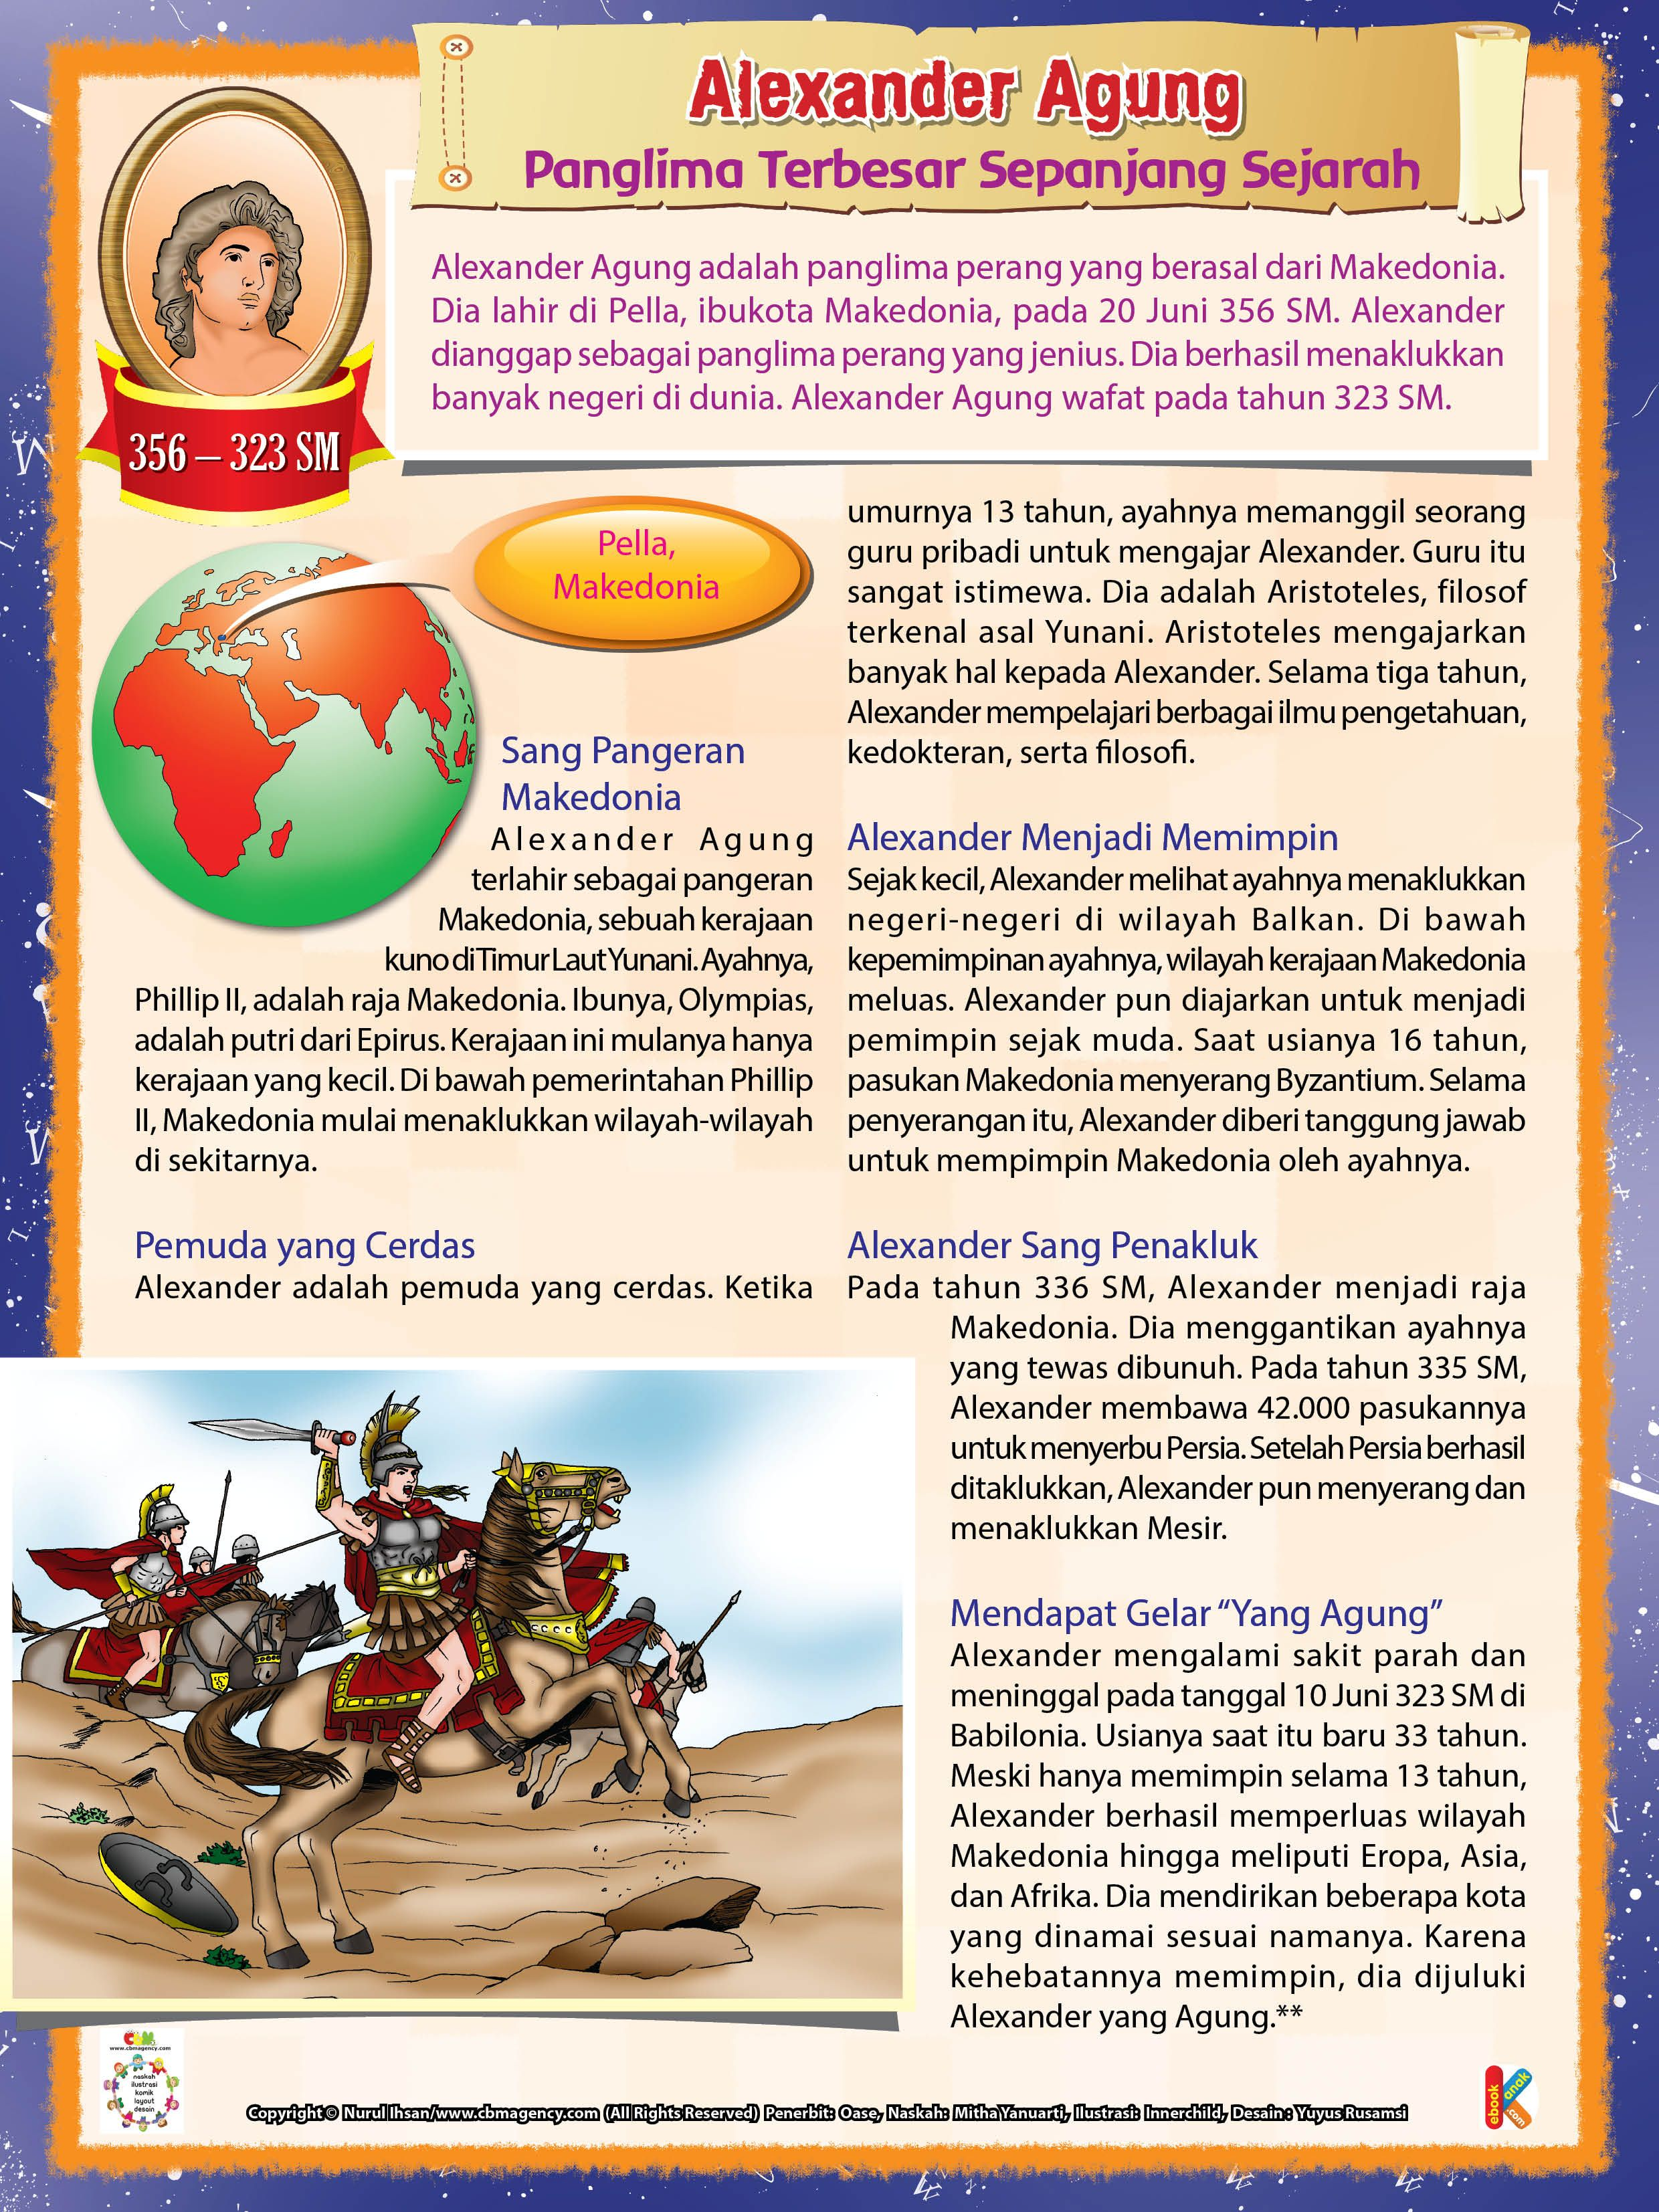 Alexander Yang Agung, Panglima Terbesar Sepanjang Sejarah